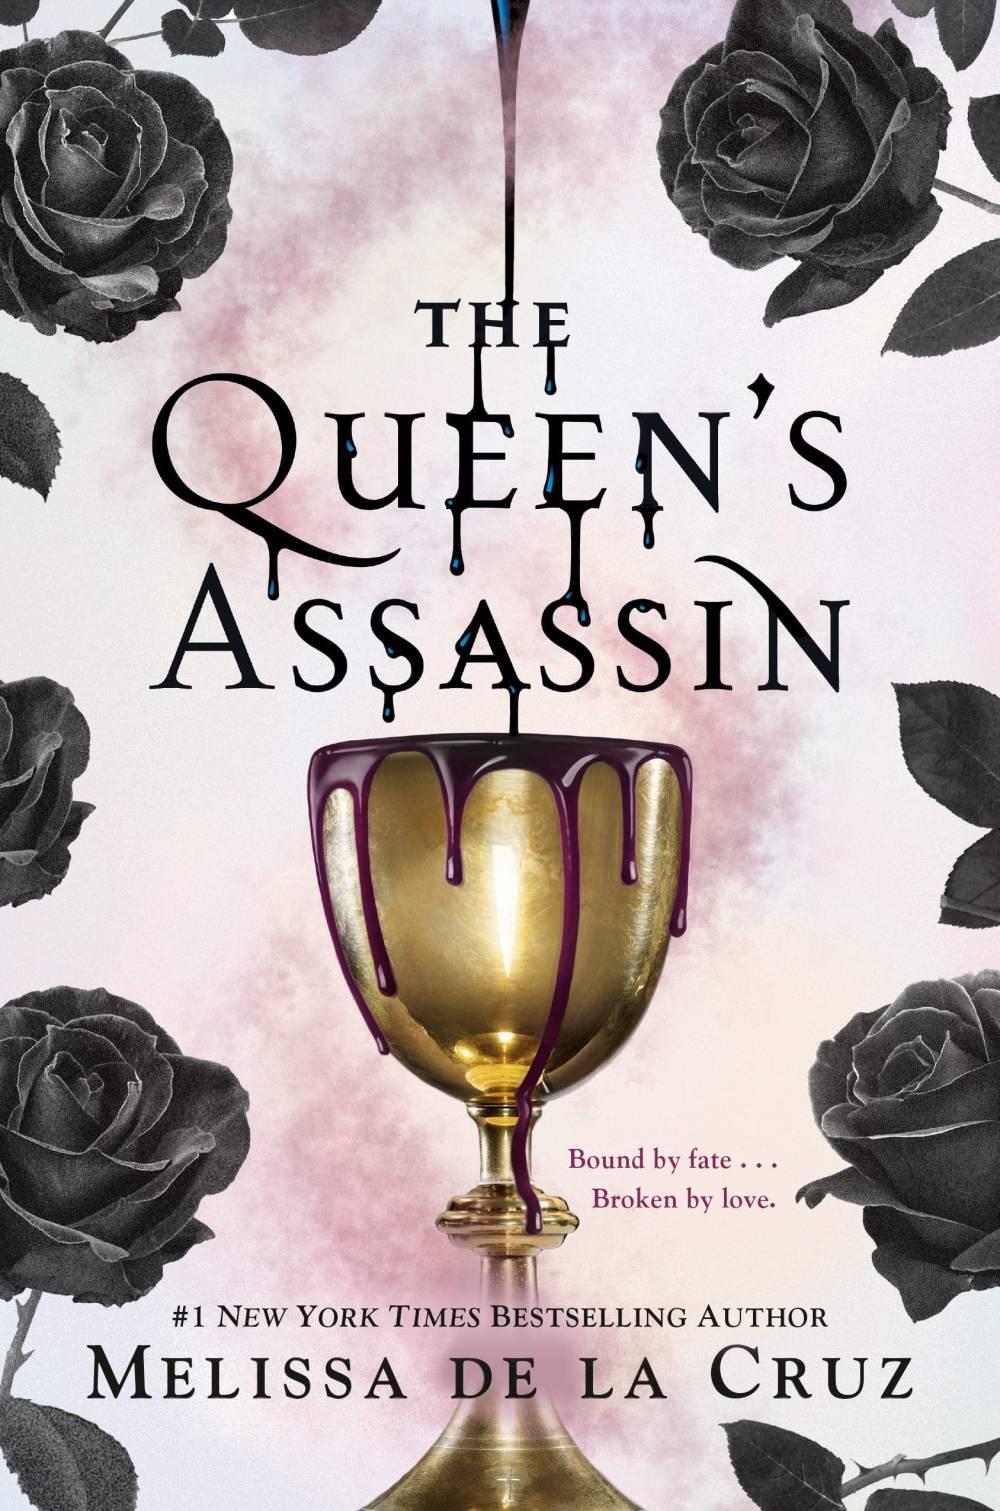 The Queen's Assassin by Melissa de la Cruz